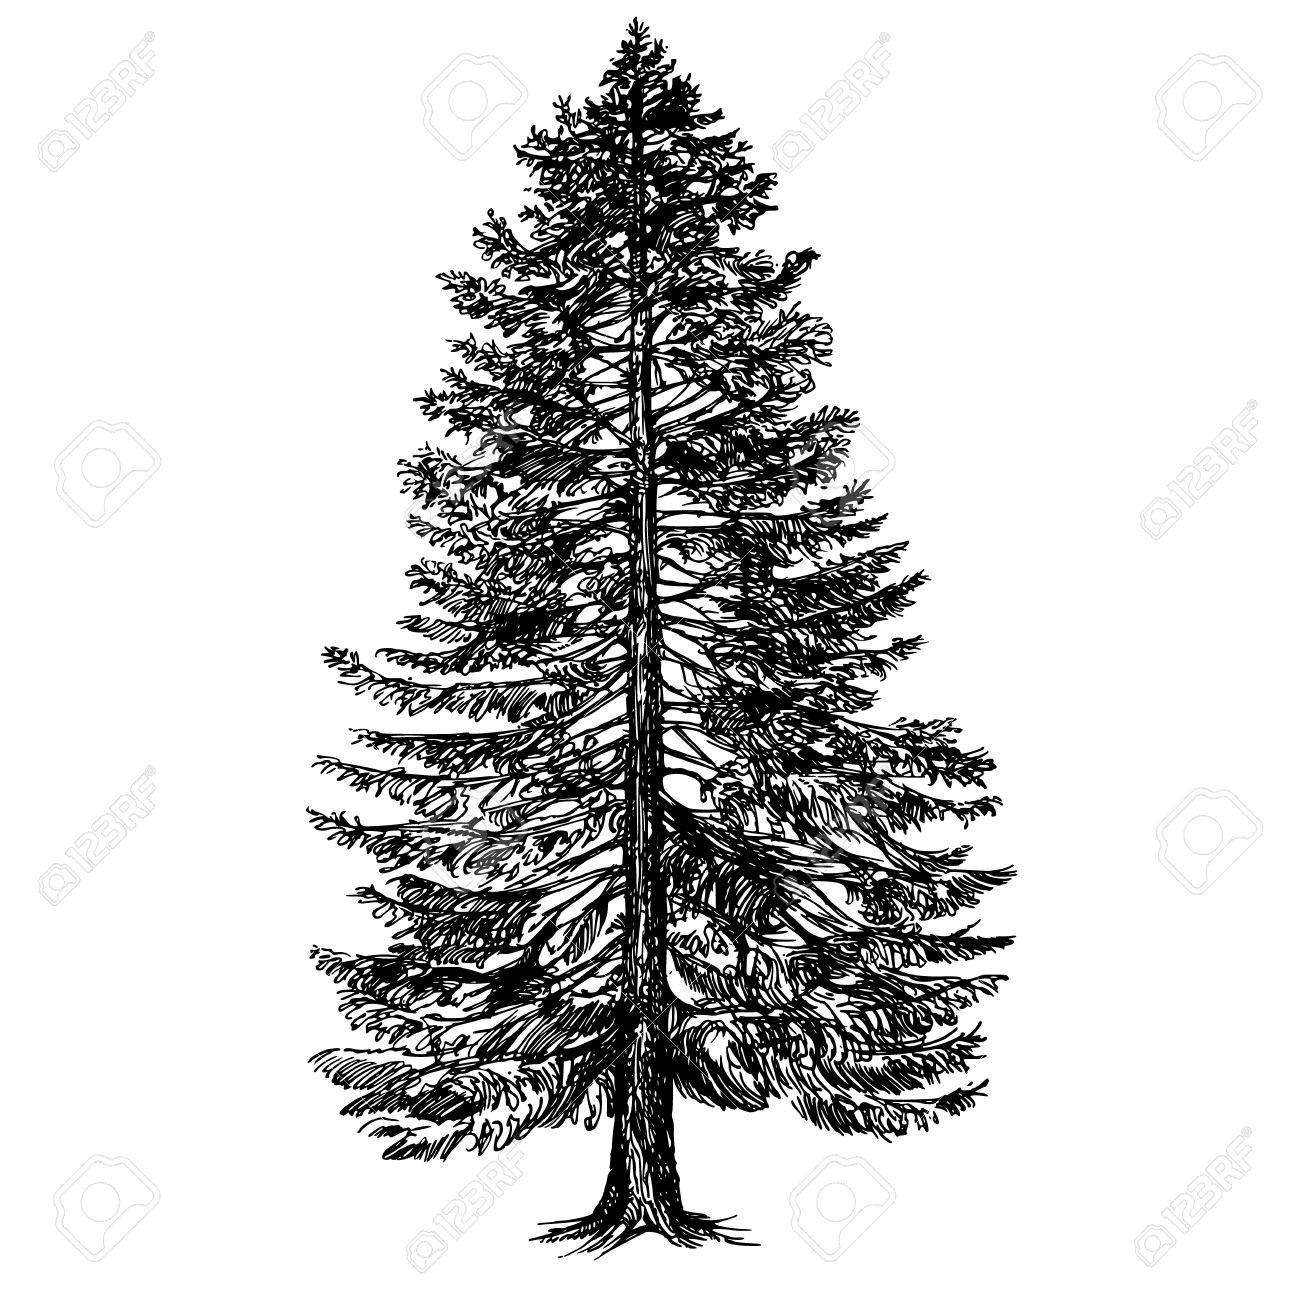 Hand drawn coniferous tree. - 67019102